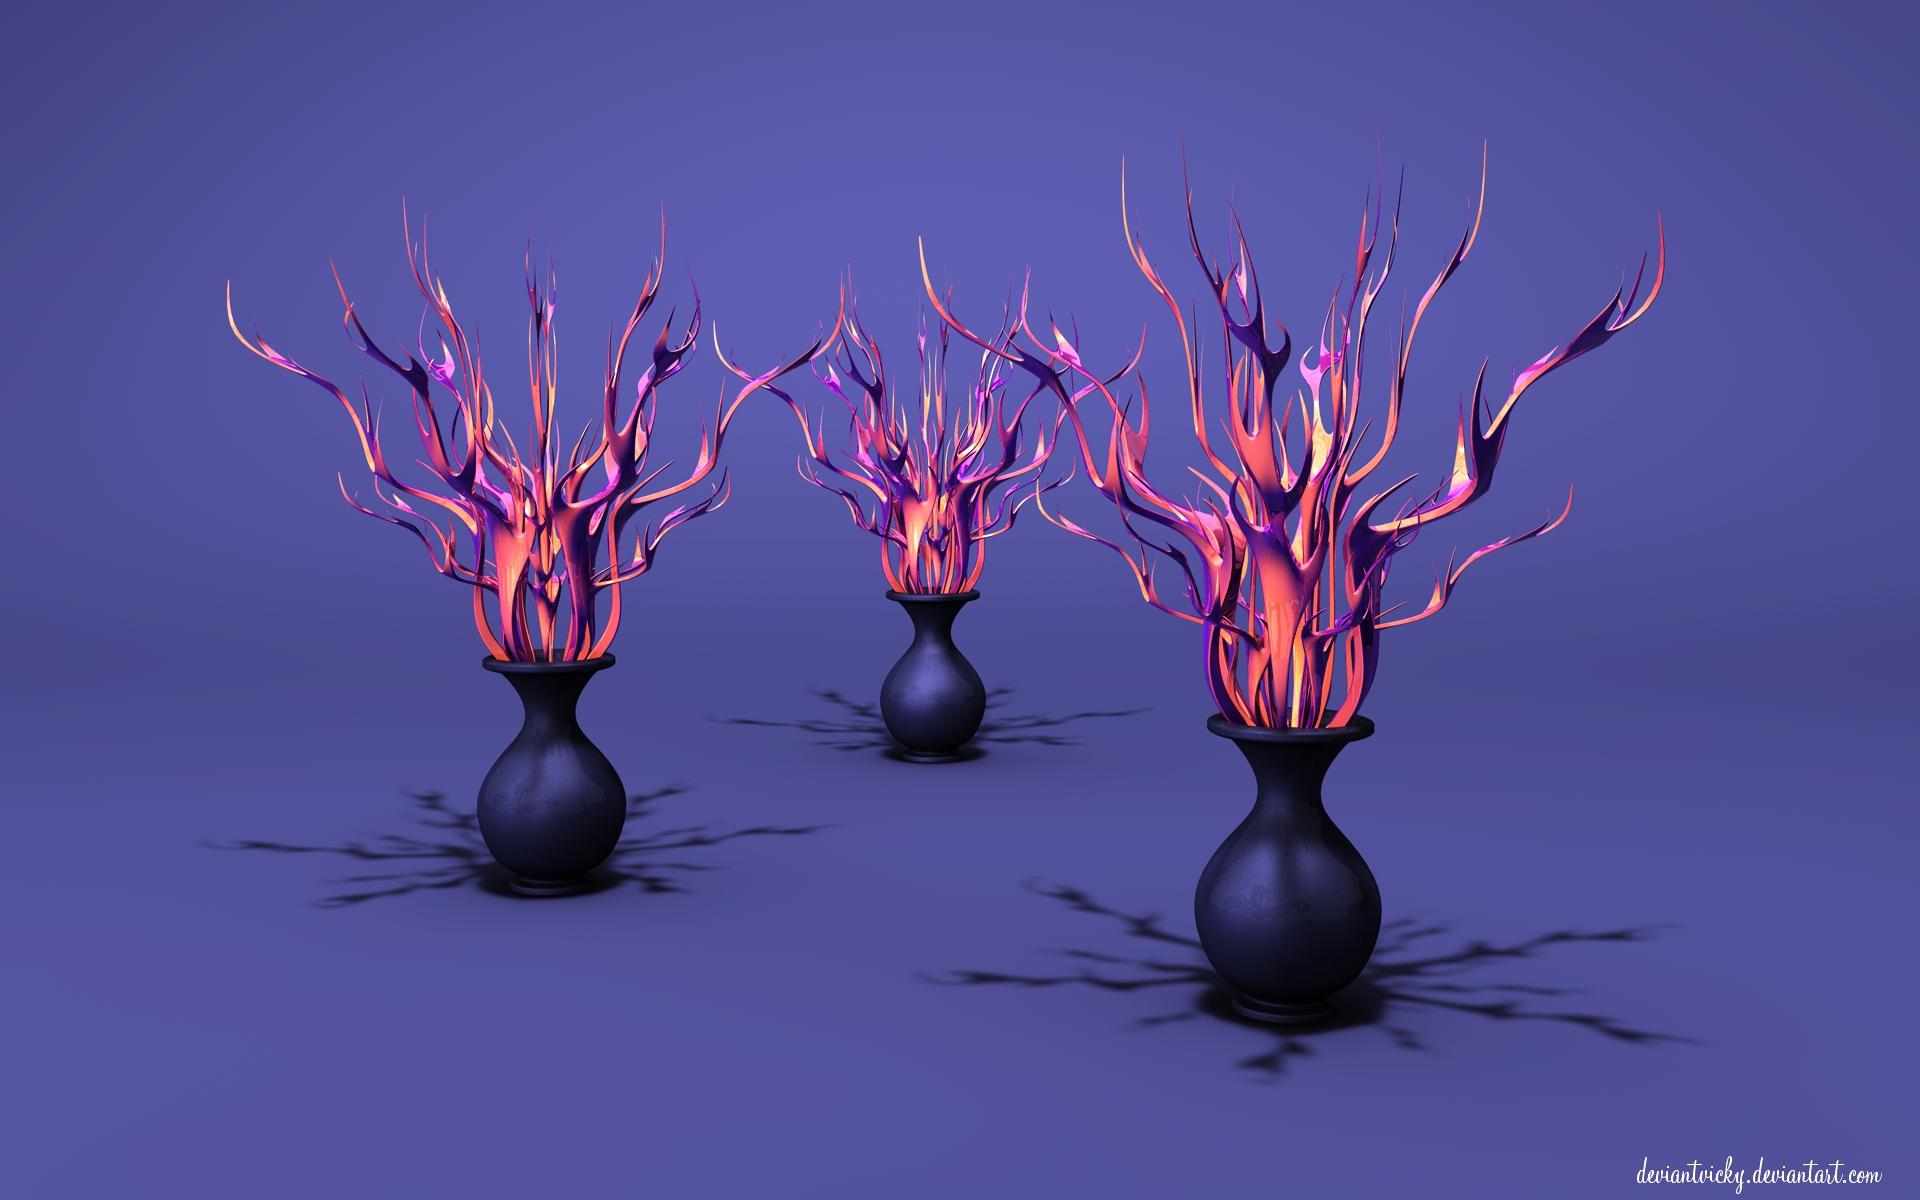 Flame Pots by VickyM72